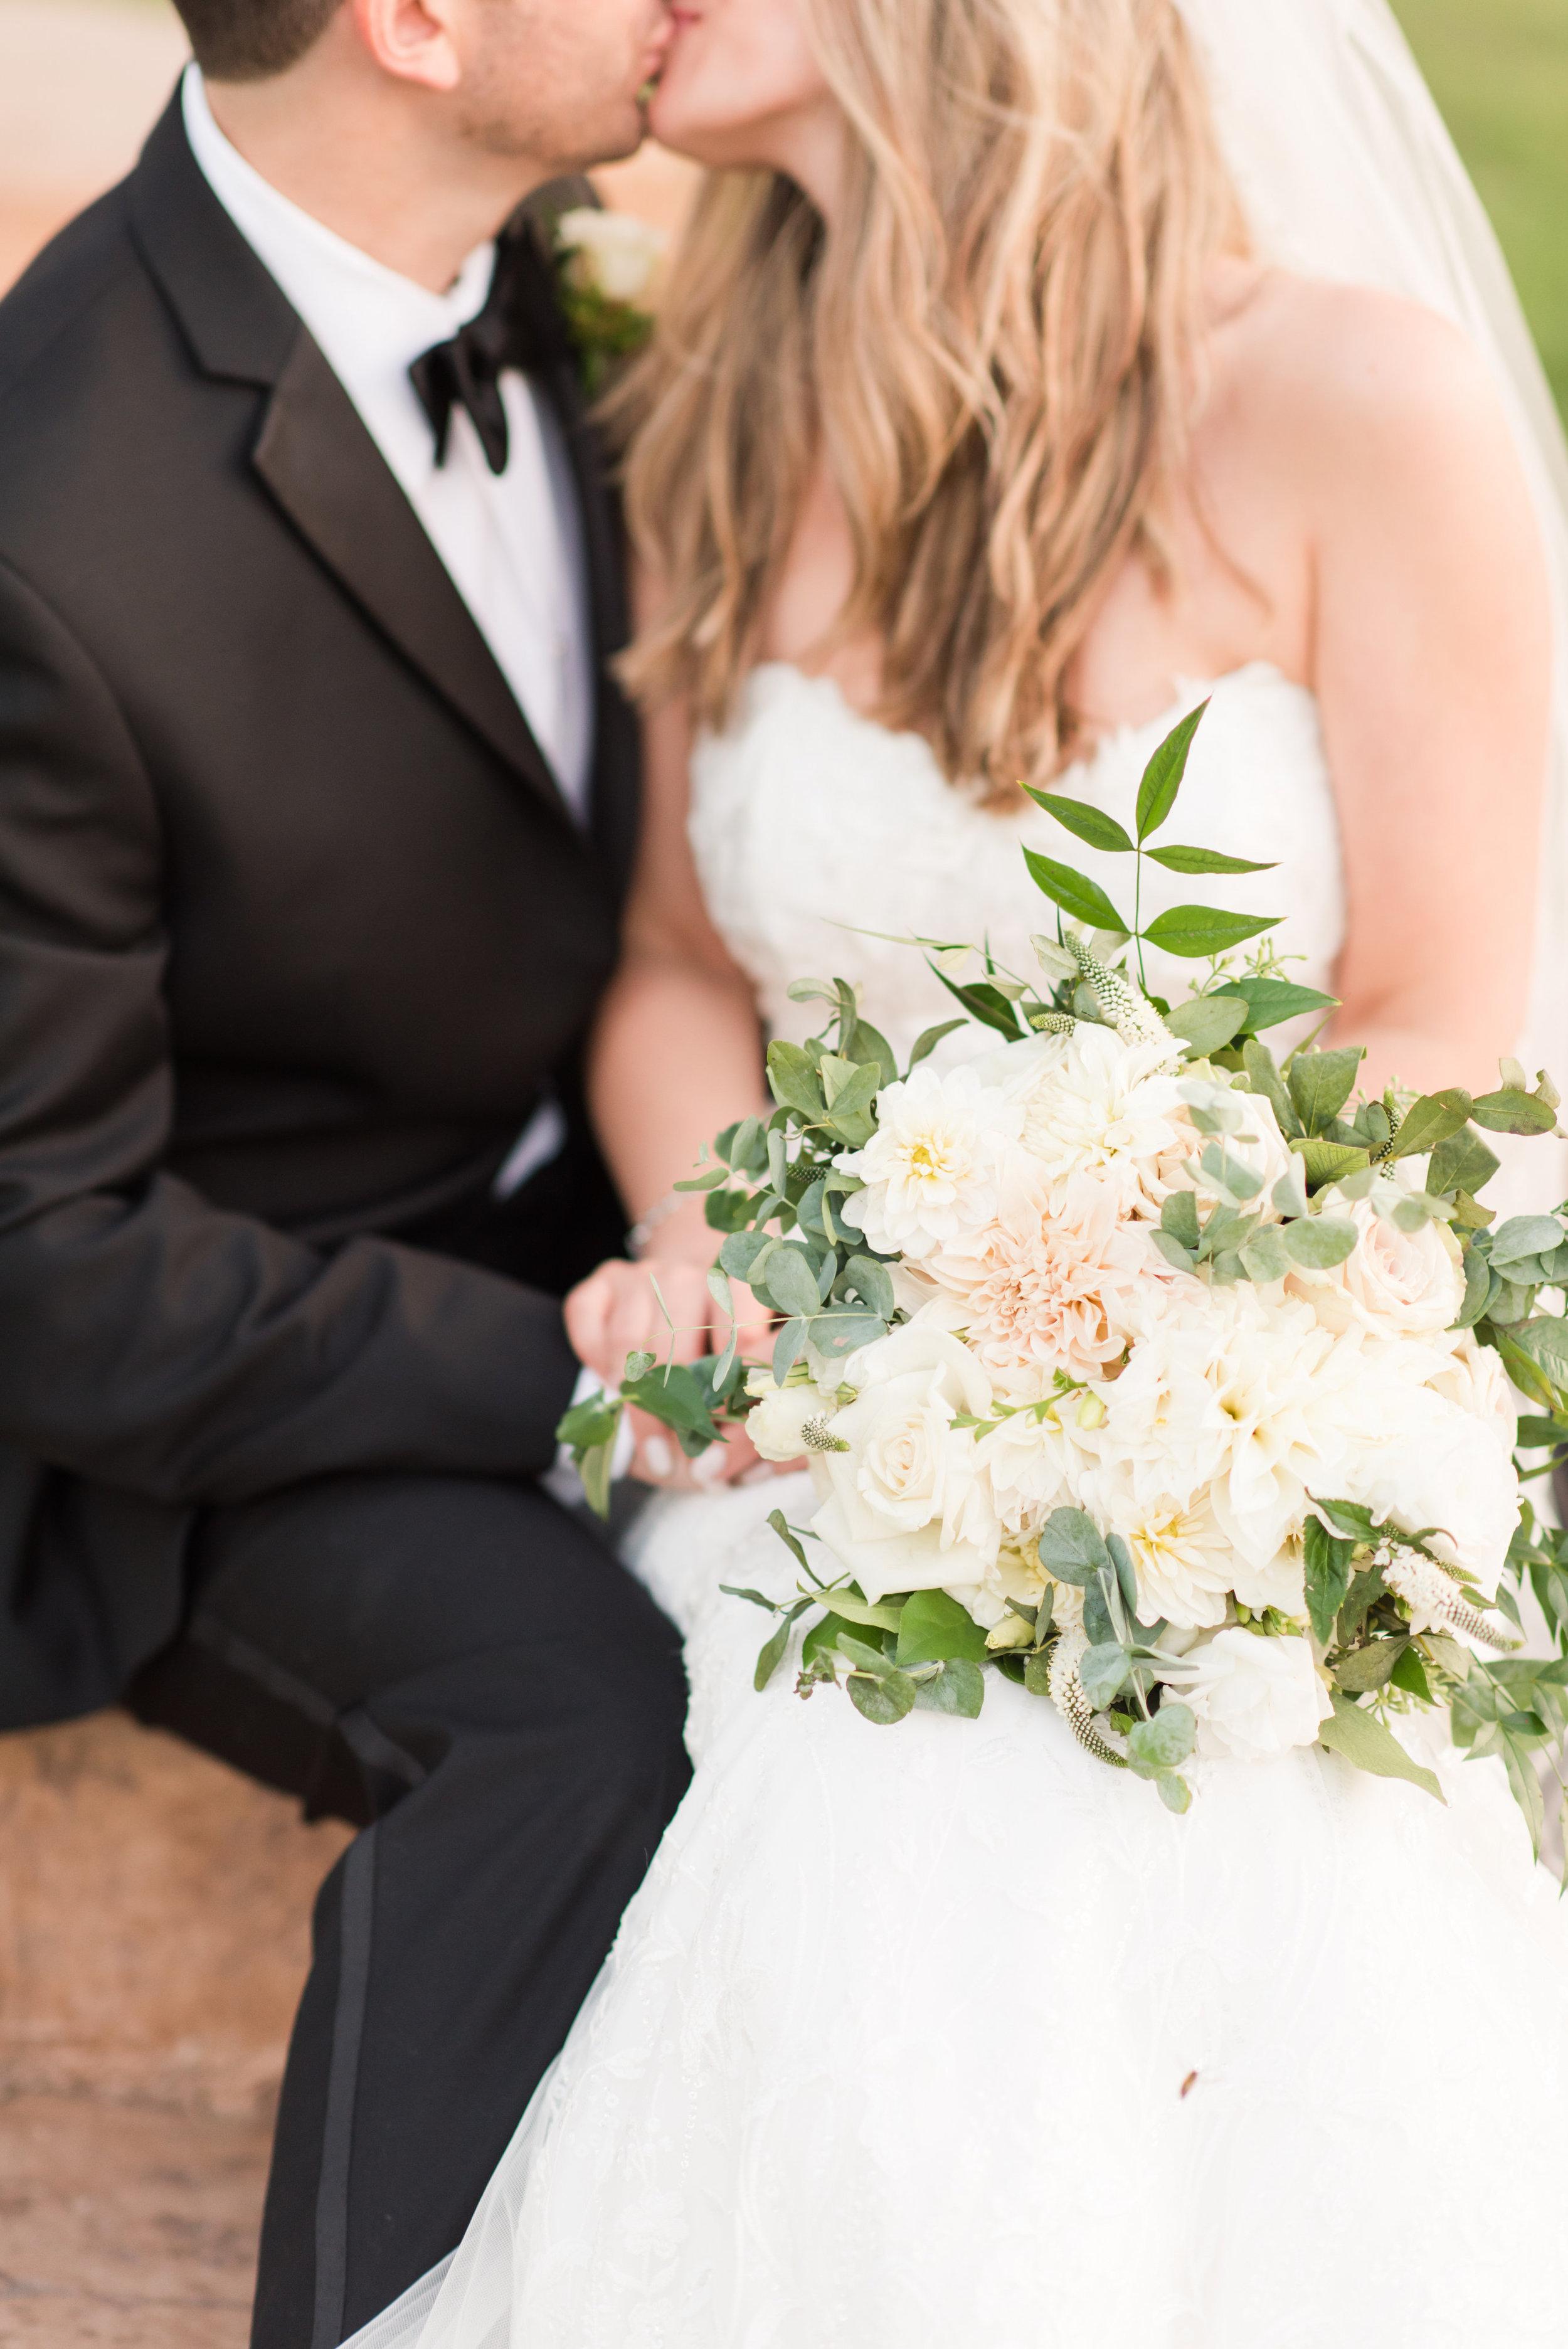 MORAIS VINEYARDS WEDDING A BEYOUTIFUL FETE EVENTS & DESIGN  - VIRGINIA AND DC WEDDING PLANNER 09.jpg